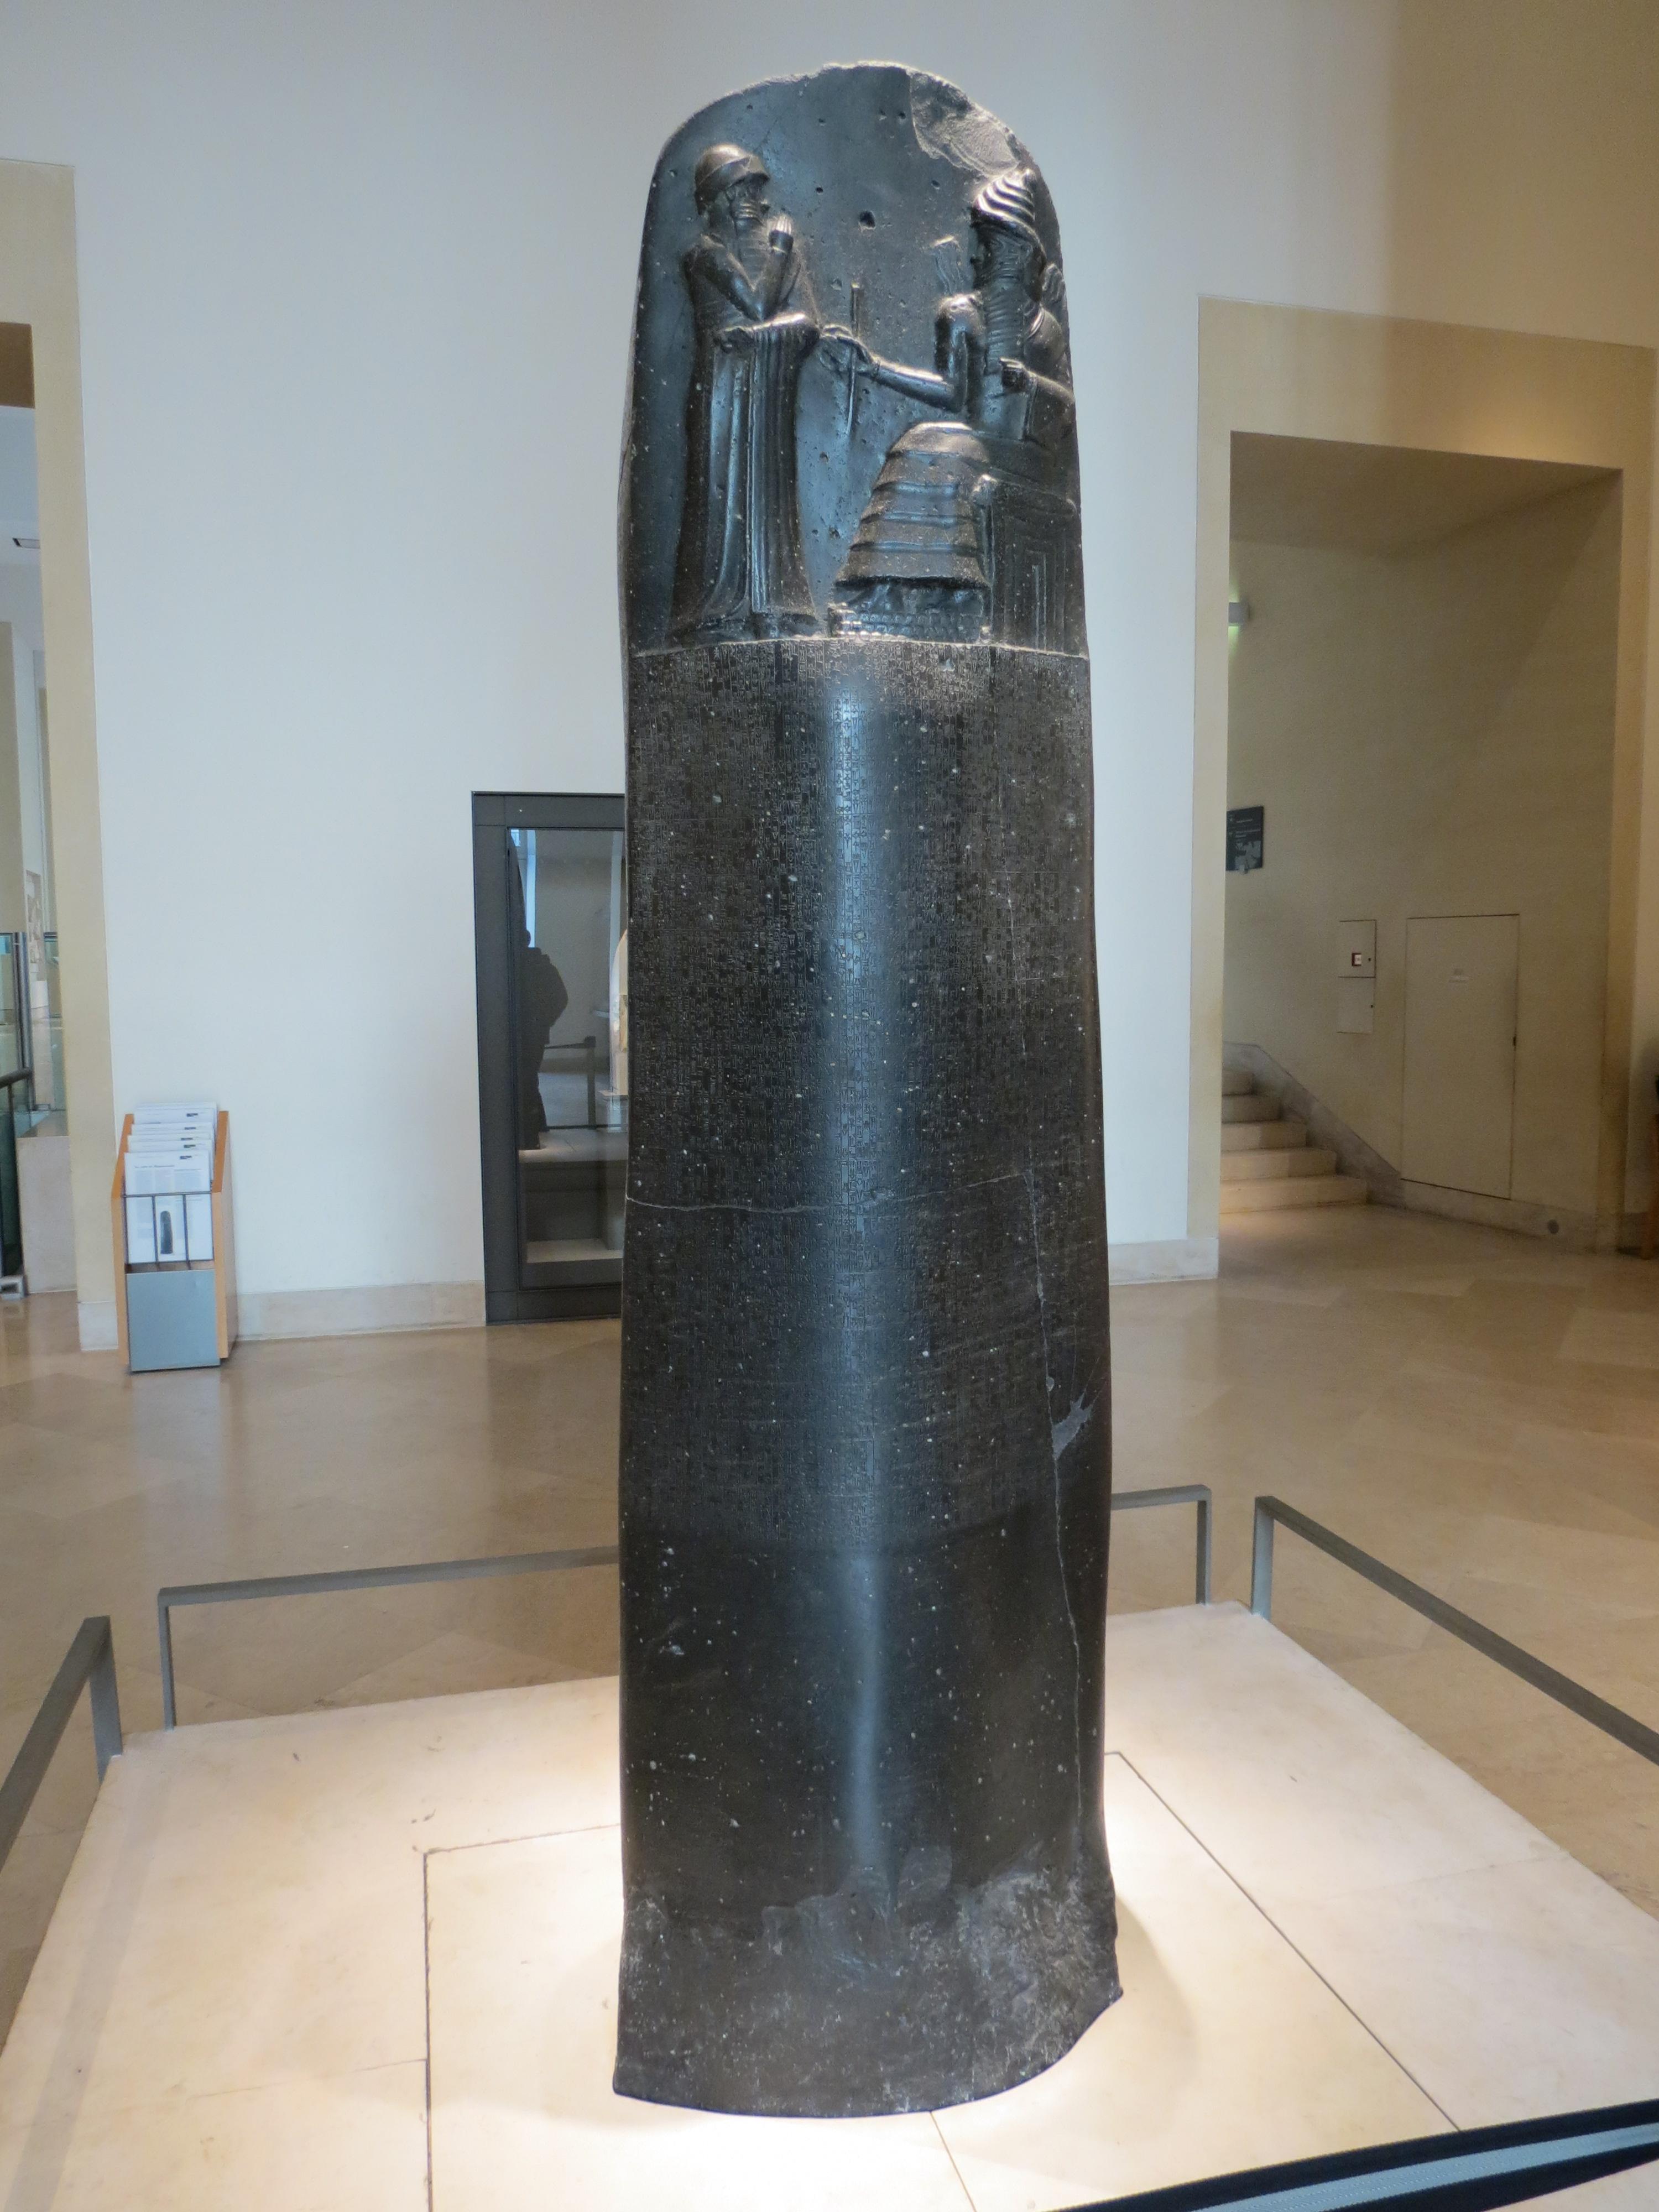 Code Of Hammurabi The Code Of Hammurabi Is A Well Preserv